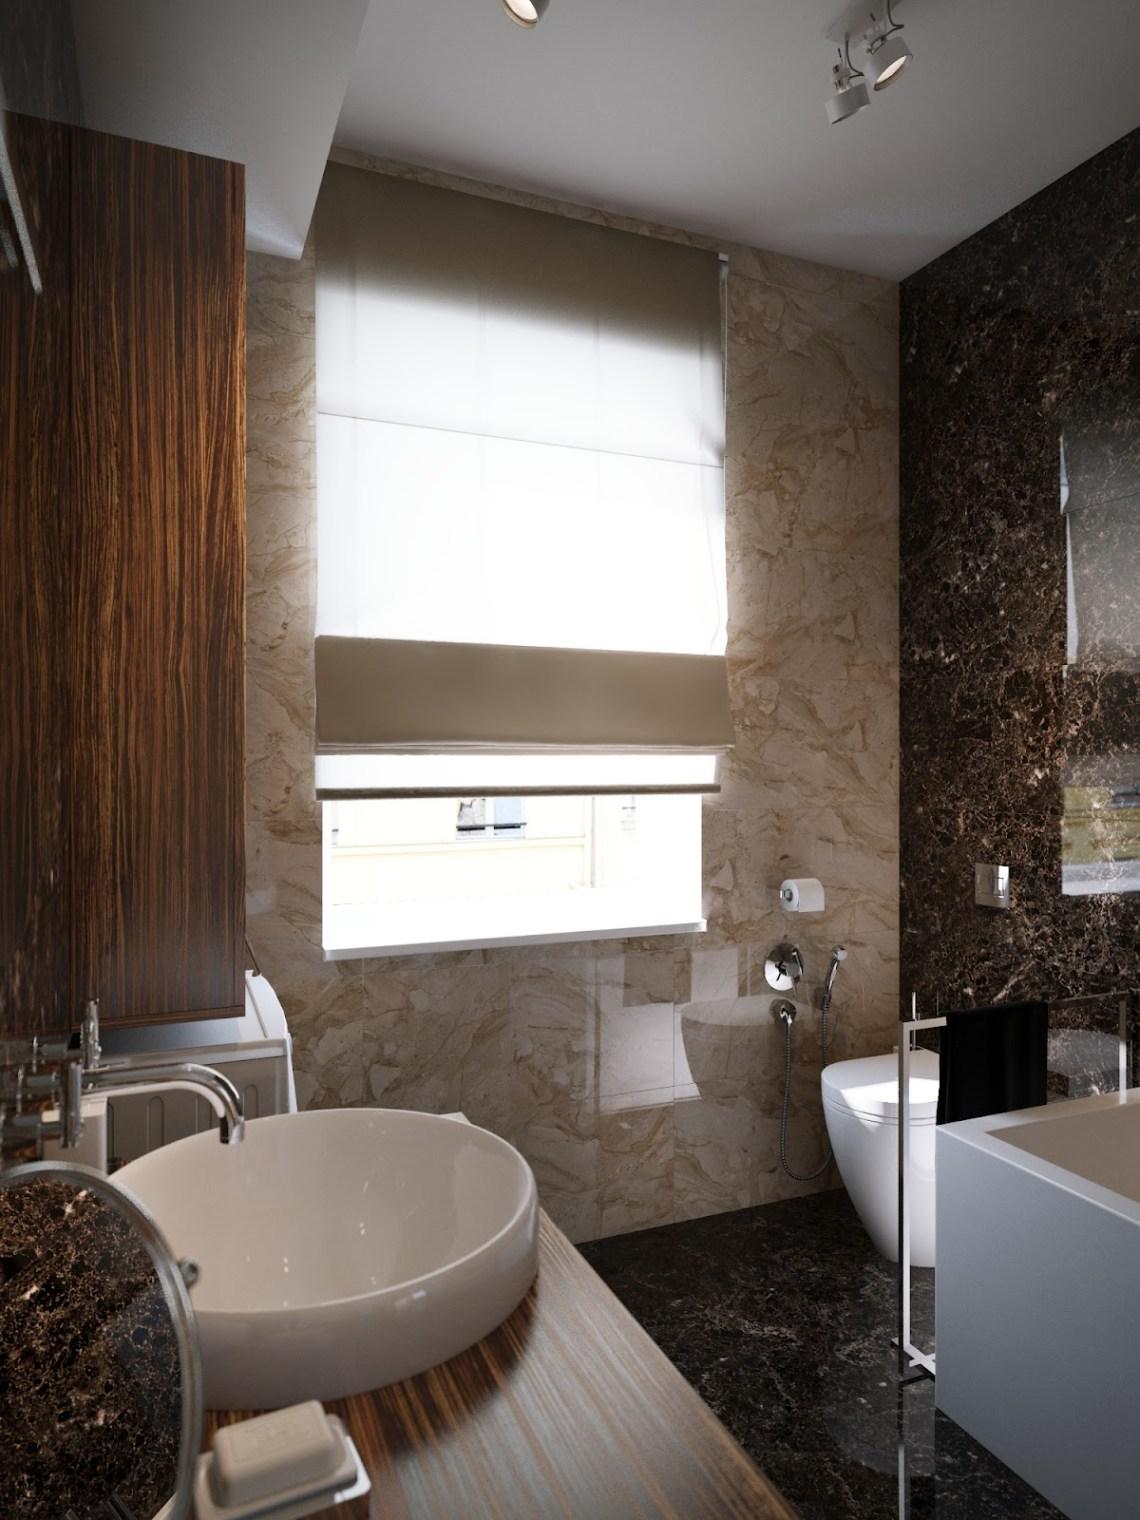 25 Modern Bathroom Design Ideas - Decoration Love